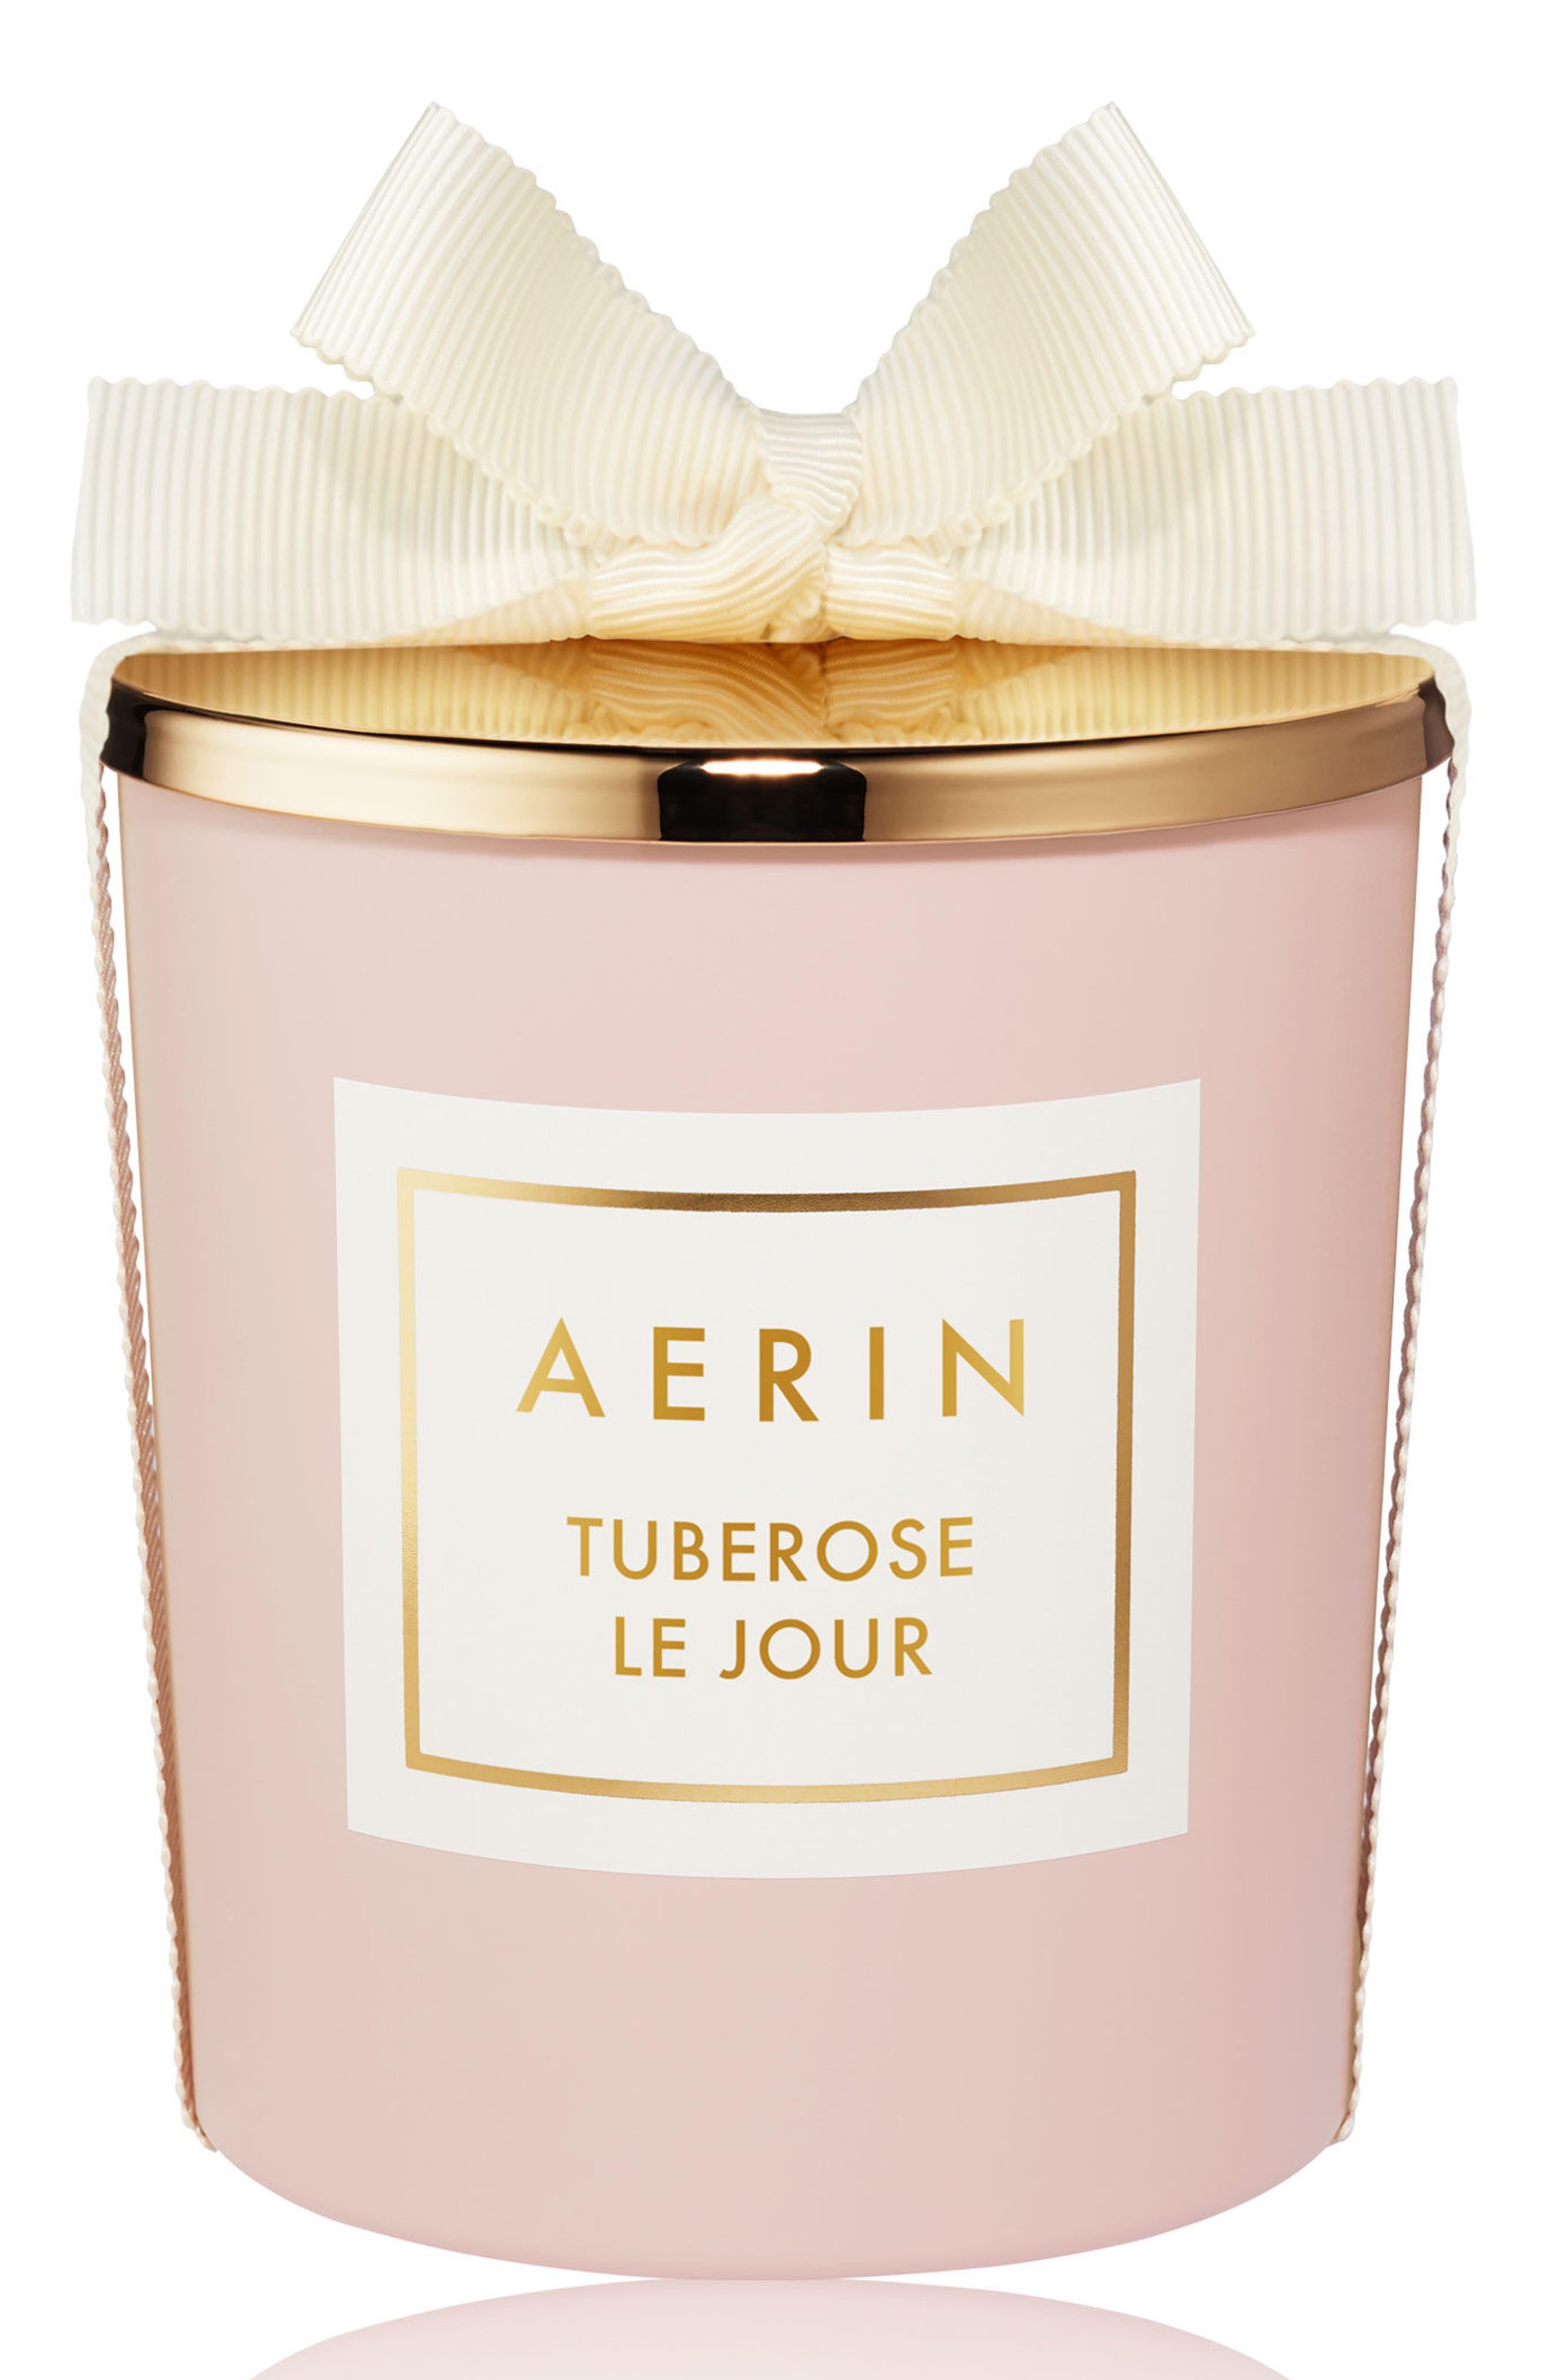 AERIN Beauty Tuberose Le Jour Candle,                         Main,                         color, 000